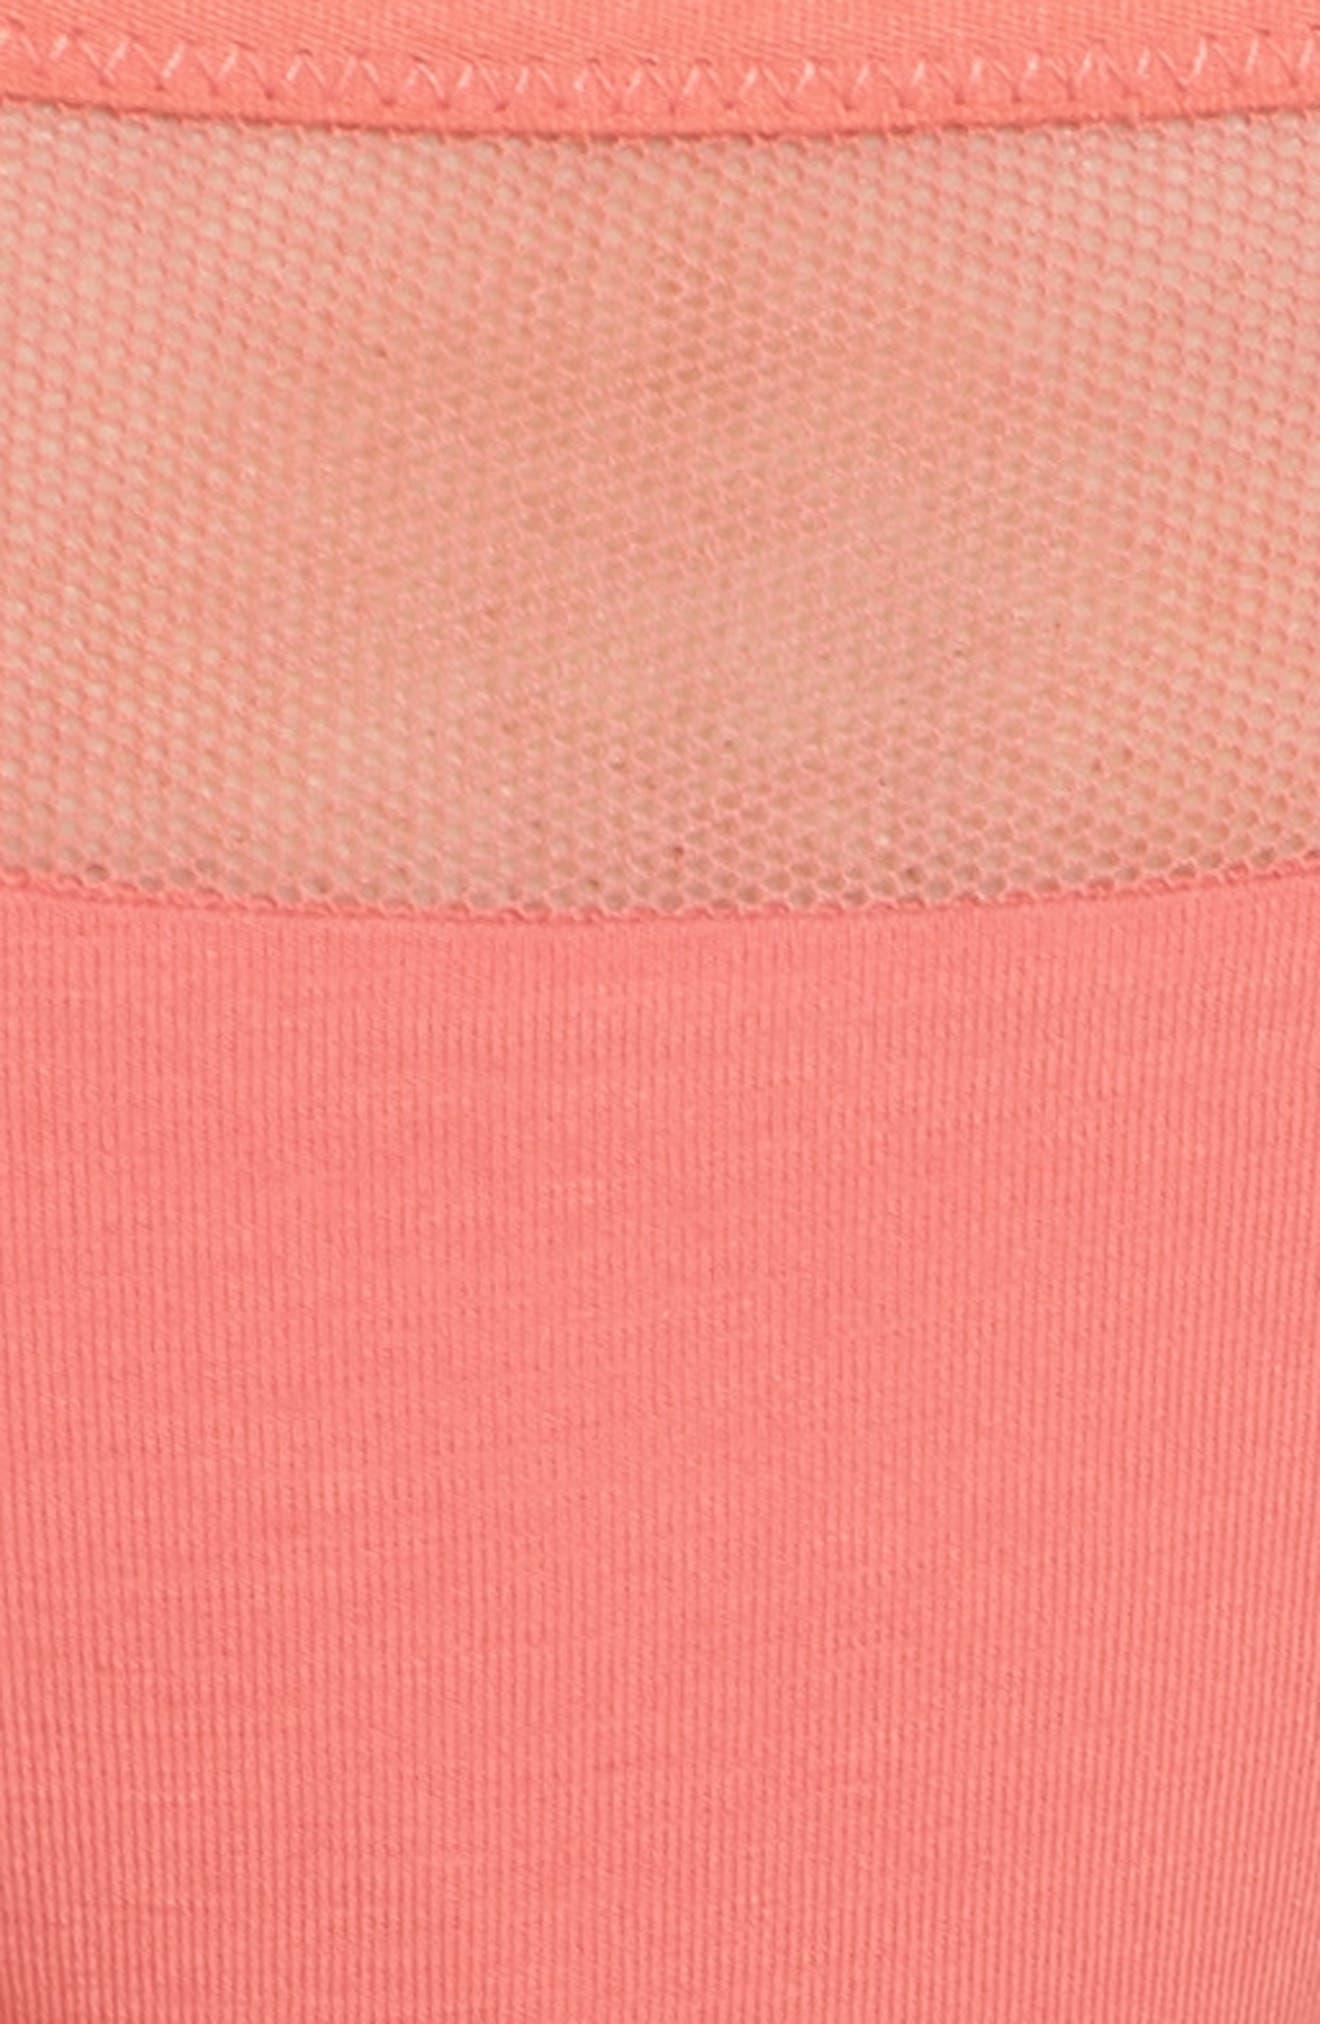 Onyx Tulle Bikini,                             Alternate thumbnail 8, color,                             Spiced Coral